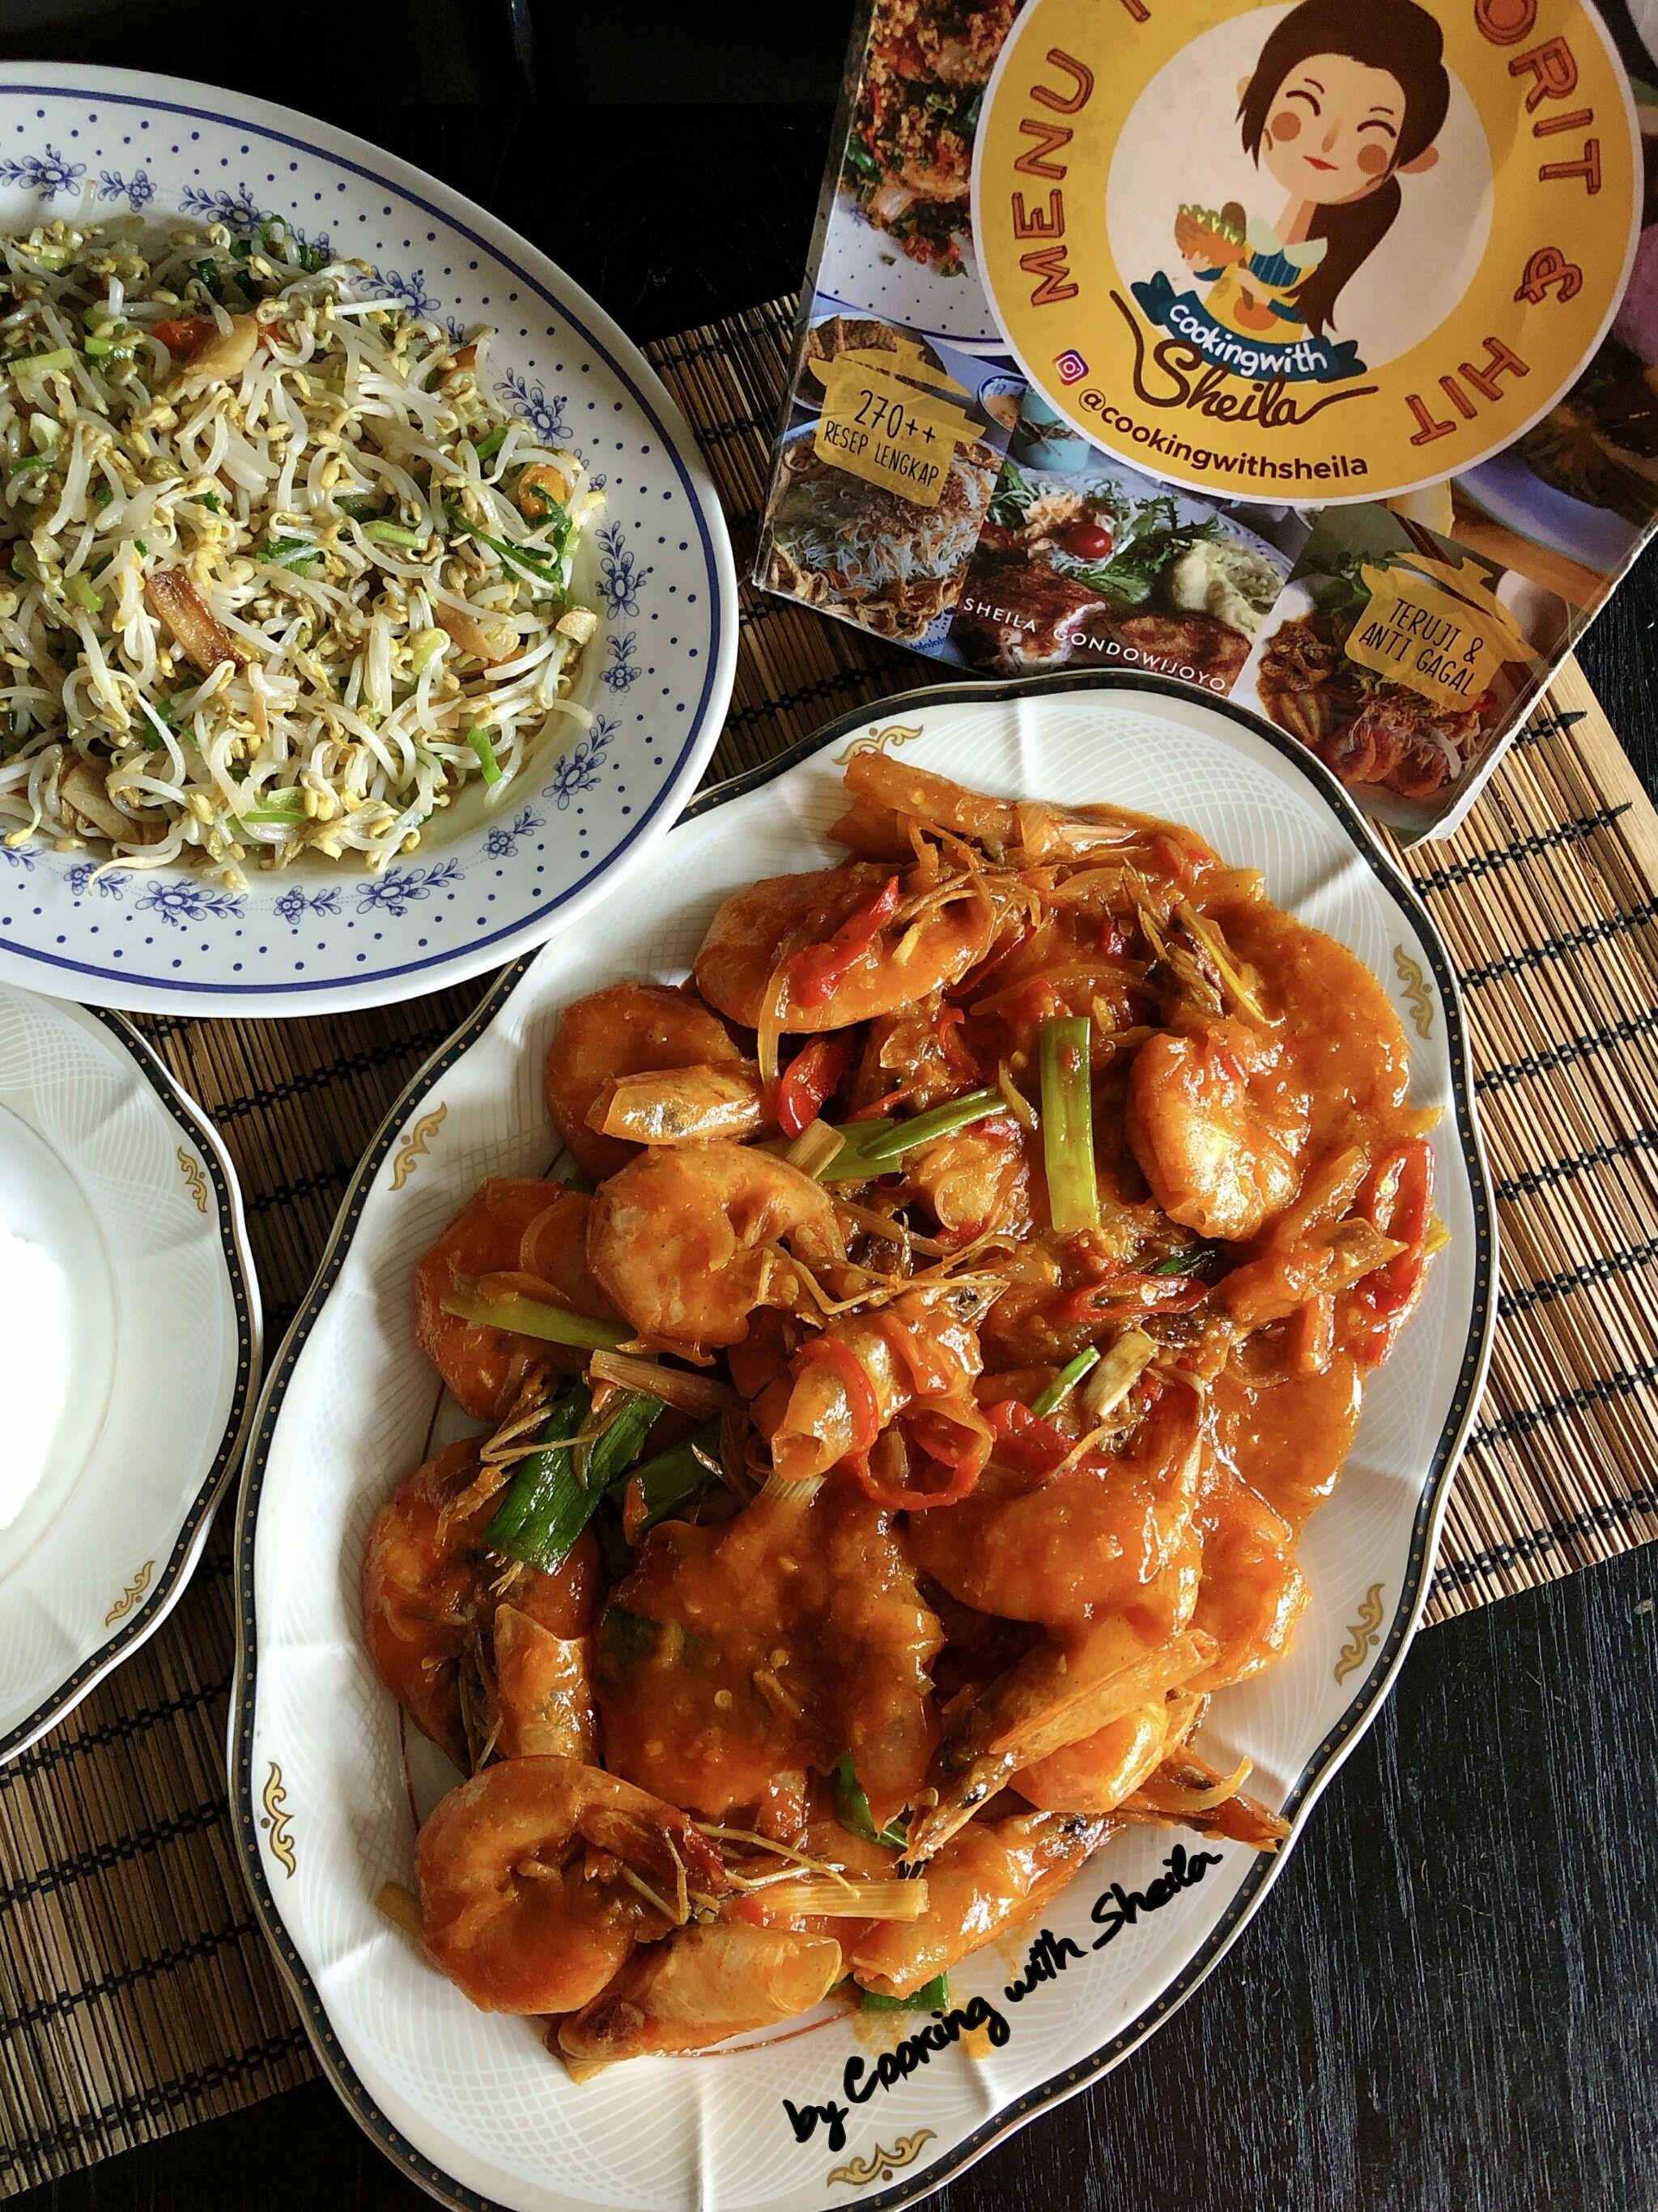 Udang Saus Padang Resep Seafood Resep Makanan Resep Masakan Indonesia